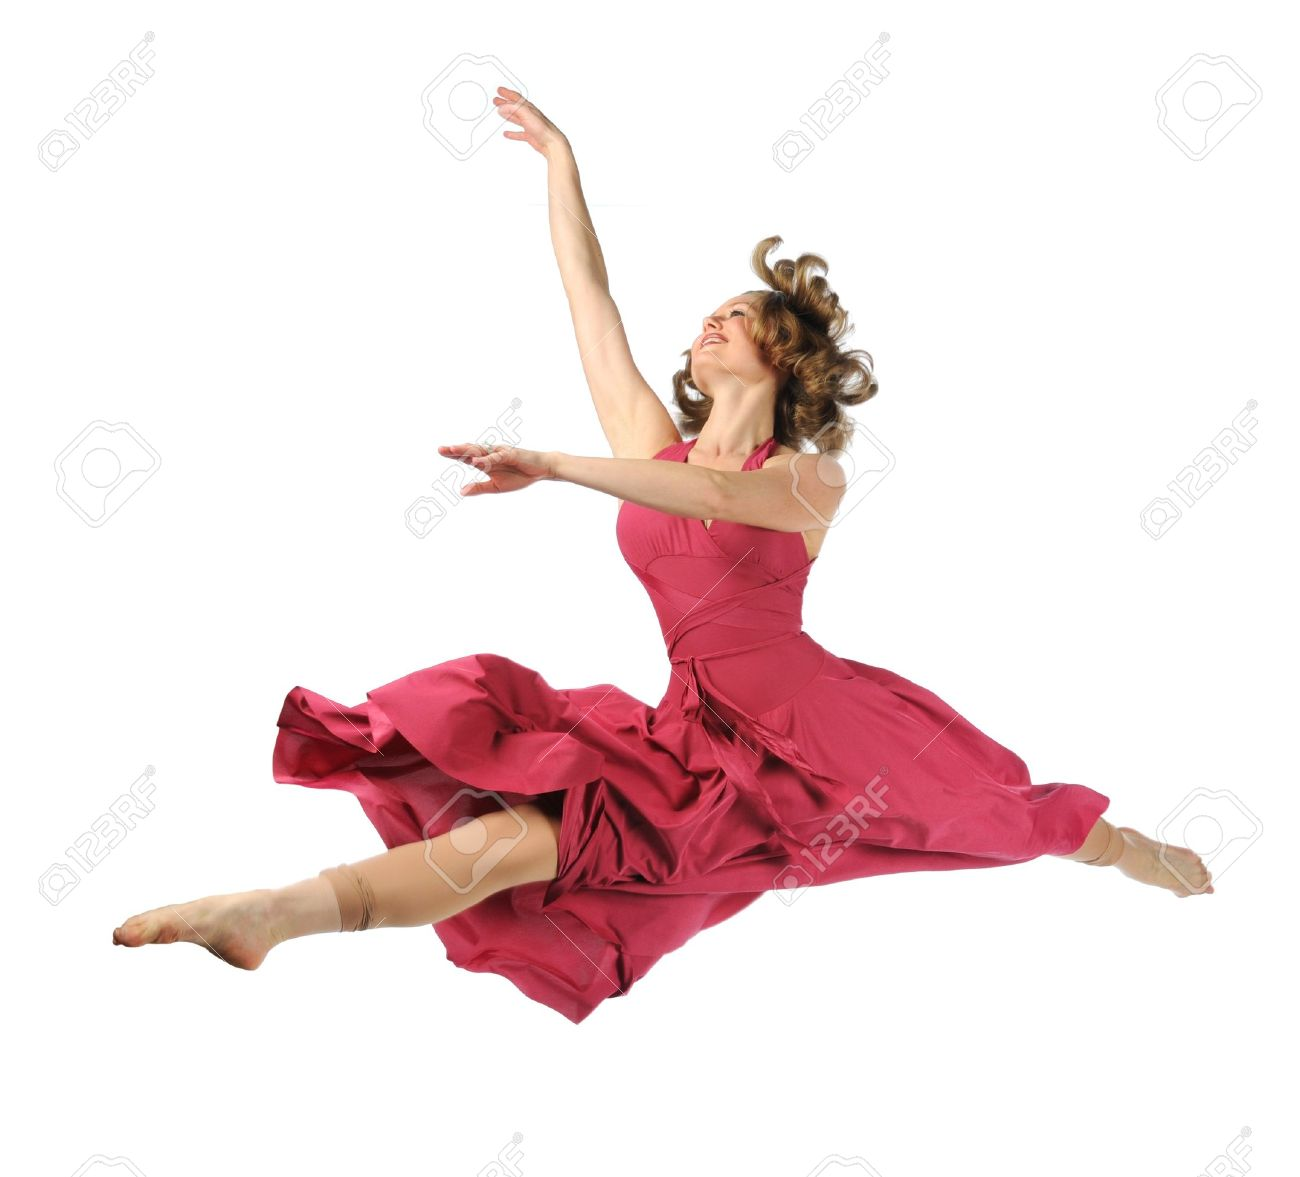 ballet dancing stock photos royalty free ballet dancing images